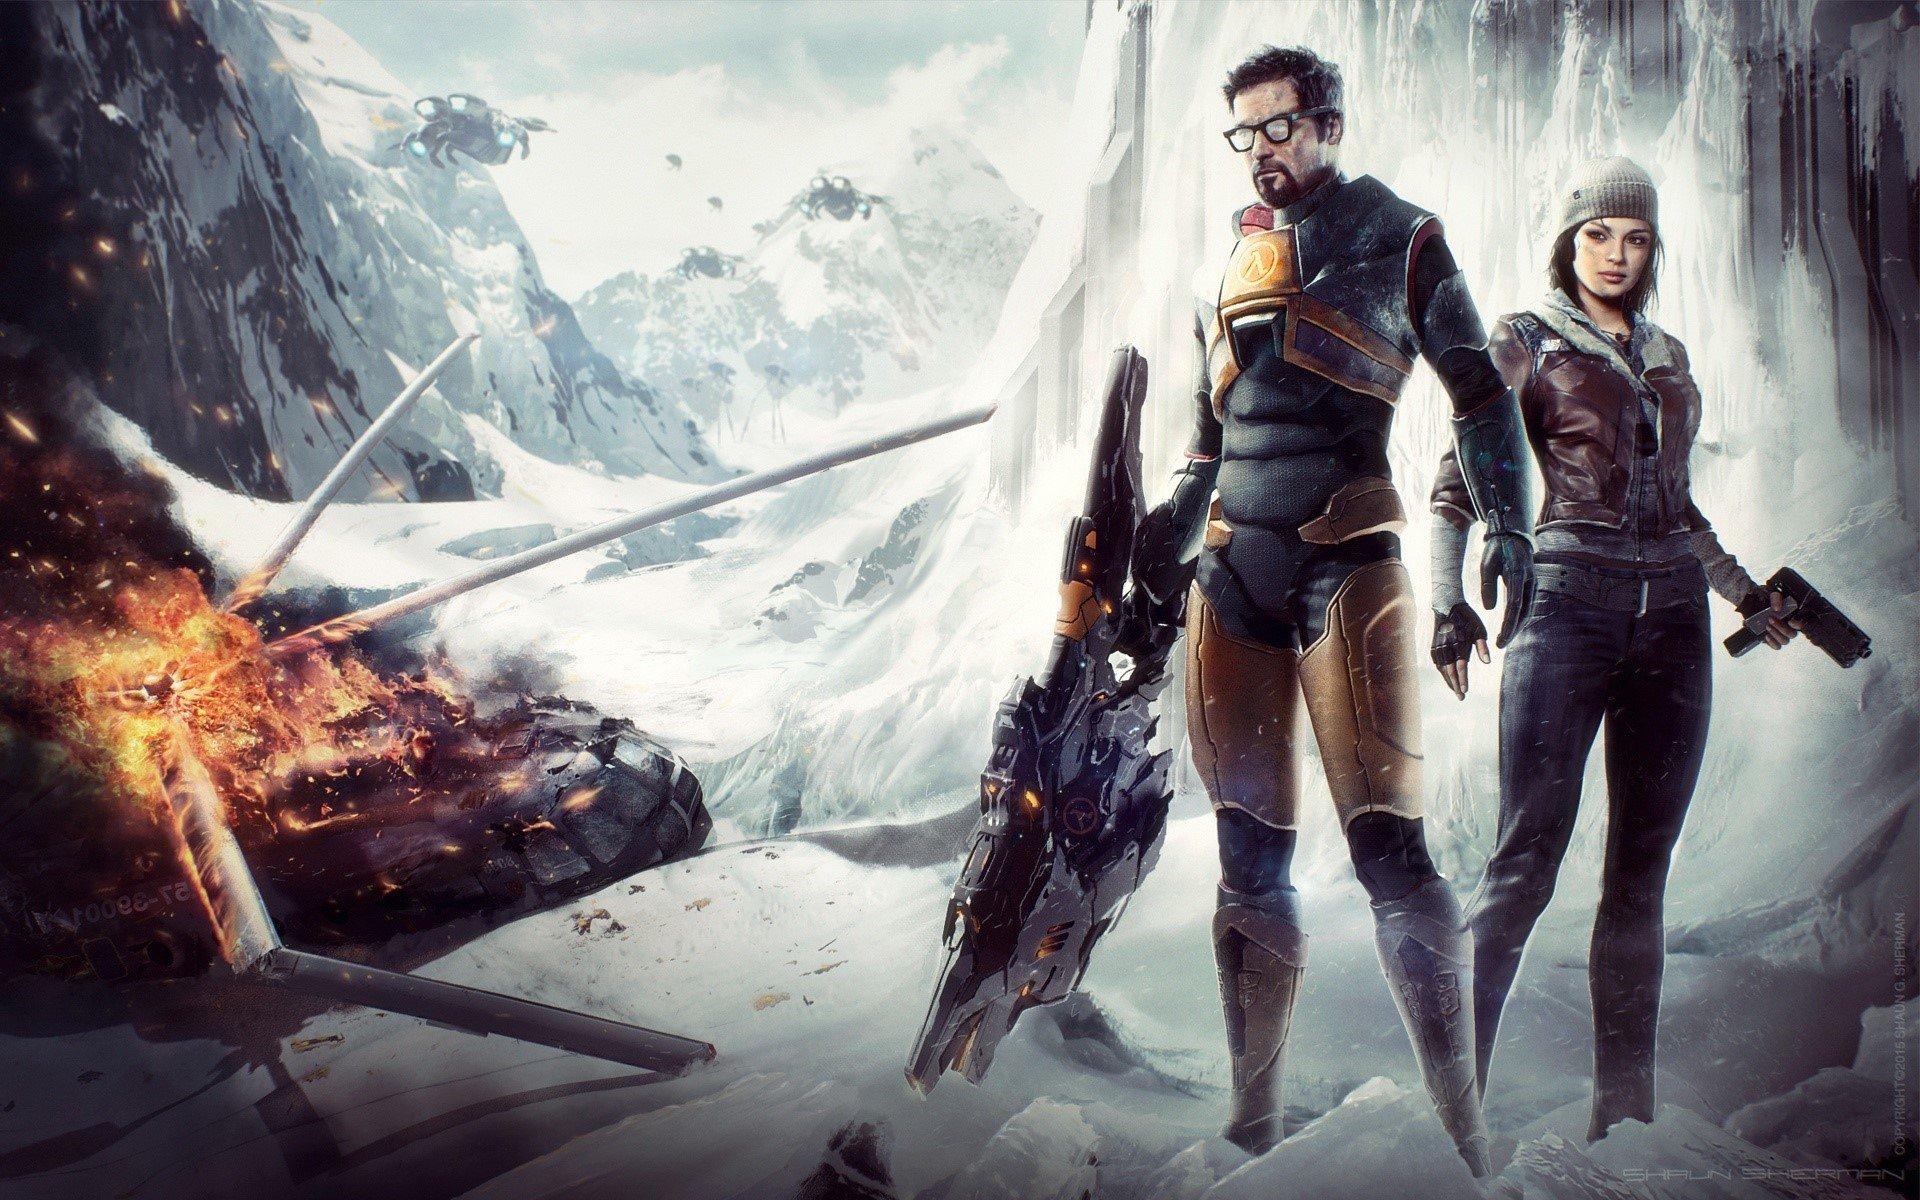 Wallpaper Gordon Freeman of Half-life